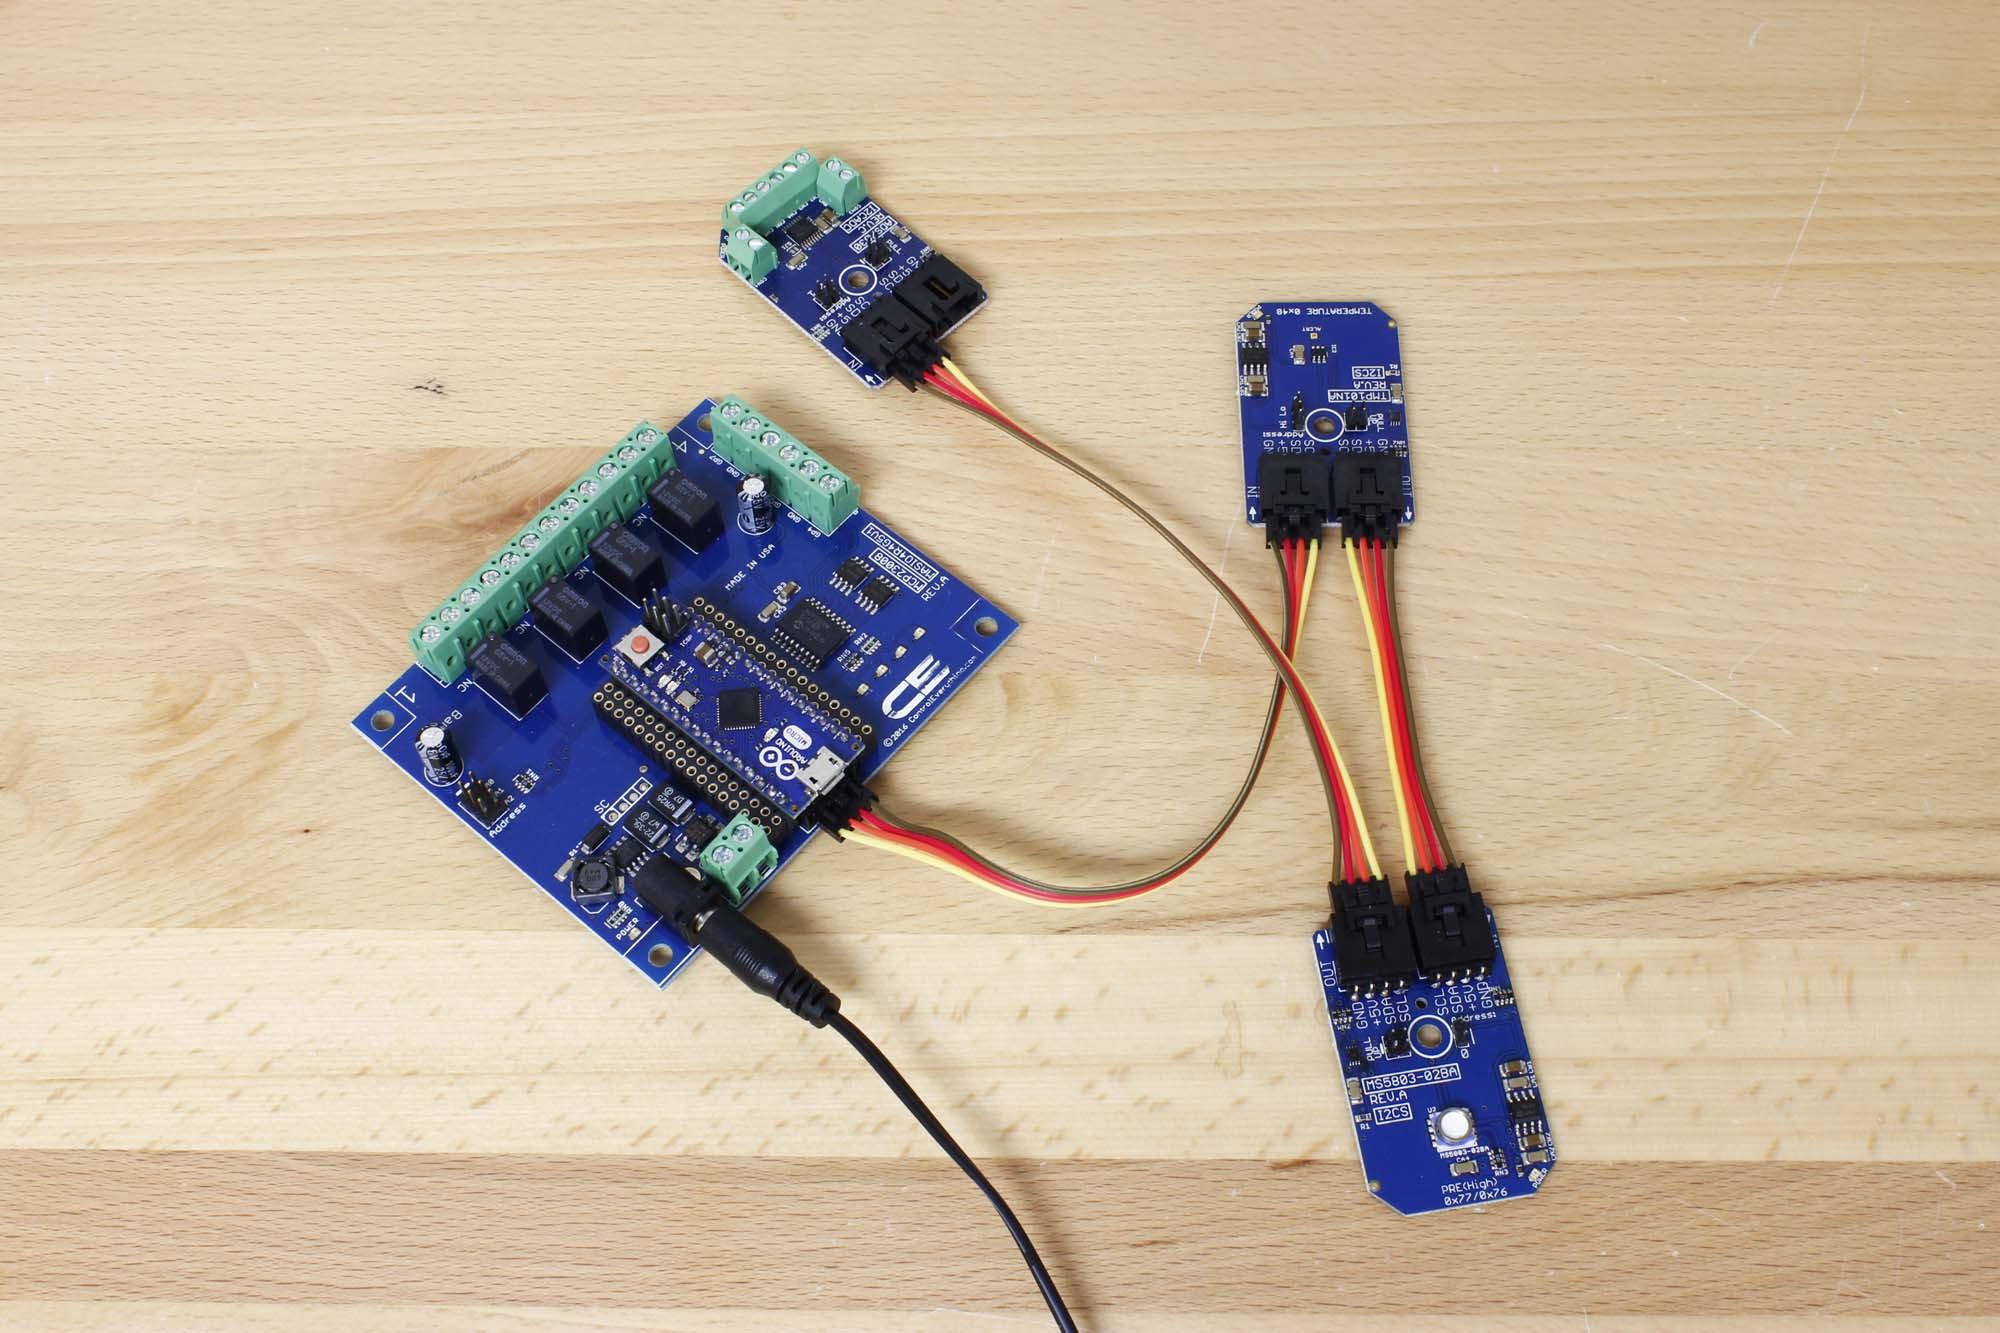 Tmp101 Digital Temperature Sensor With Alert Function I2c Mini Arduino Micro Relay Shield Pressure Potentiometer